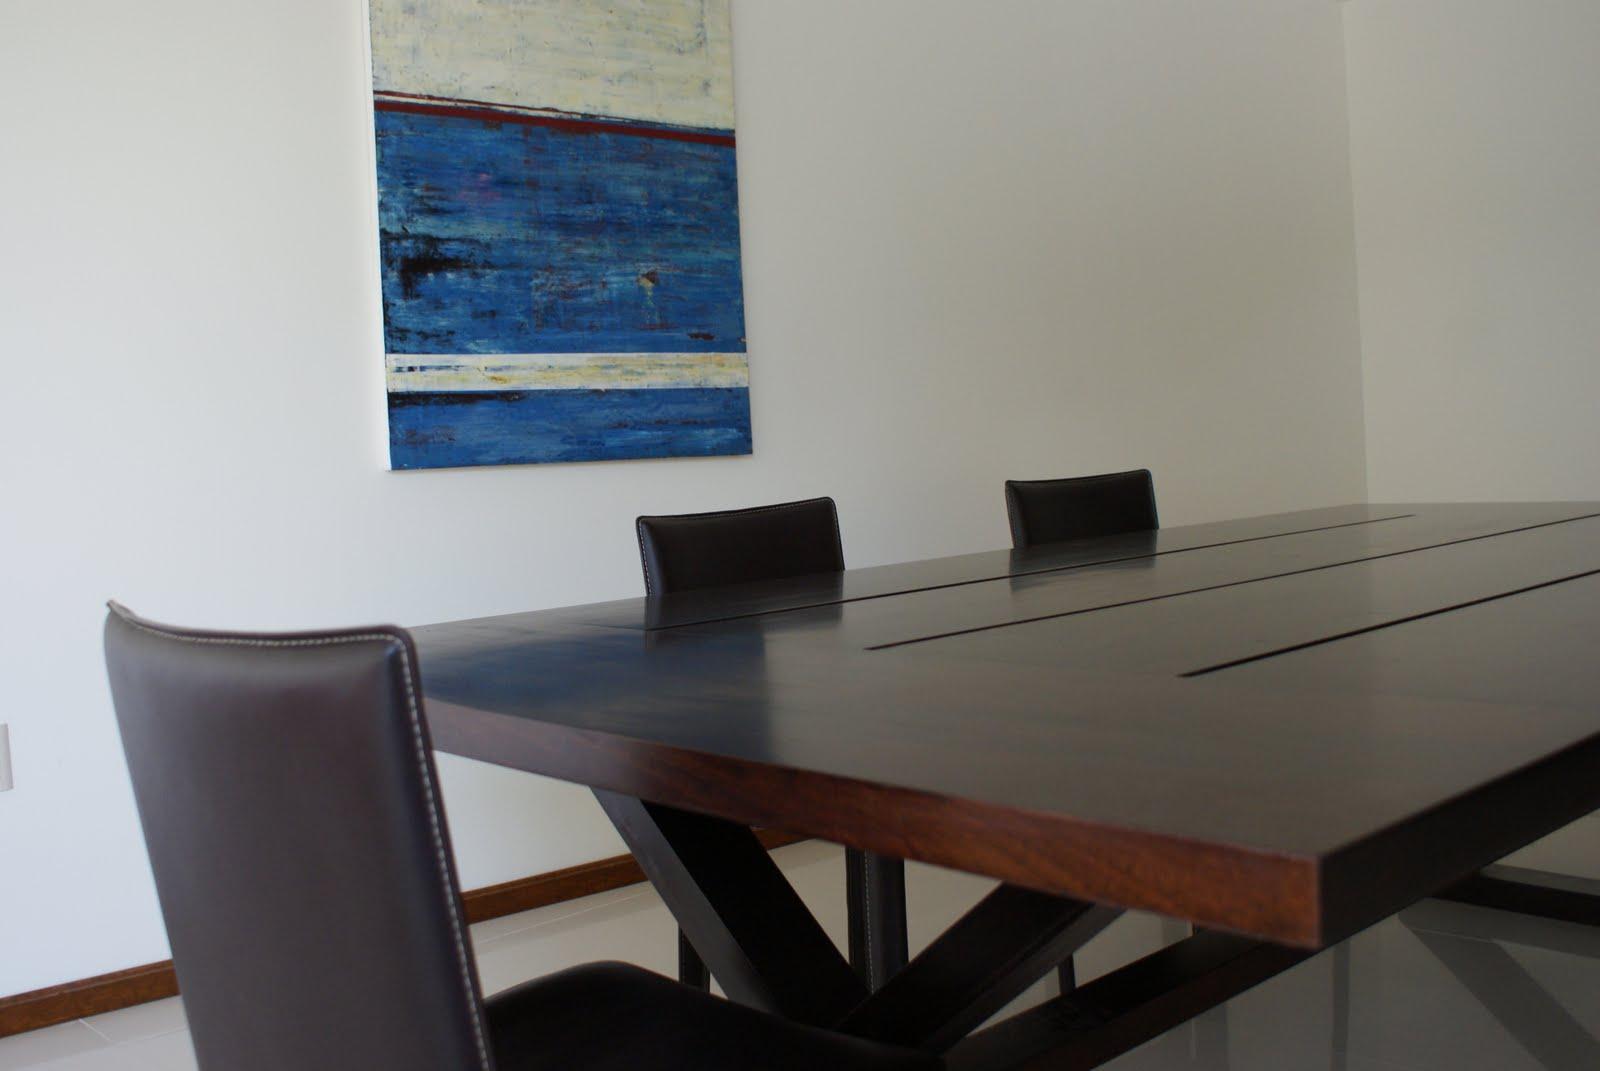 Mesa comedor muebles sobre dise o avl for Mesas de comedor coloniales